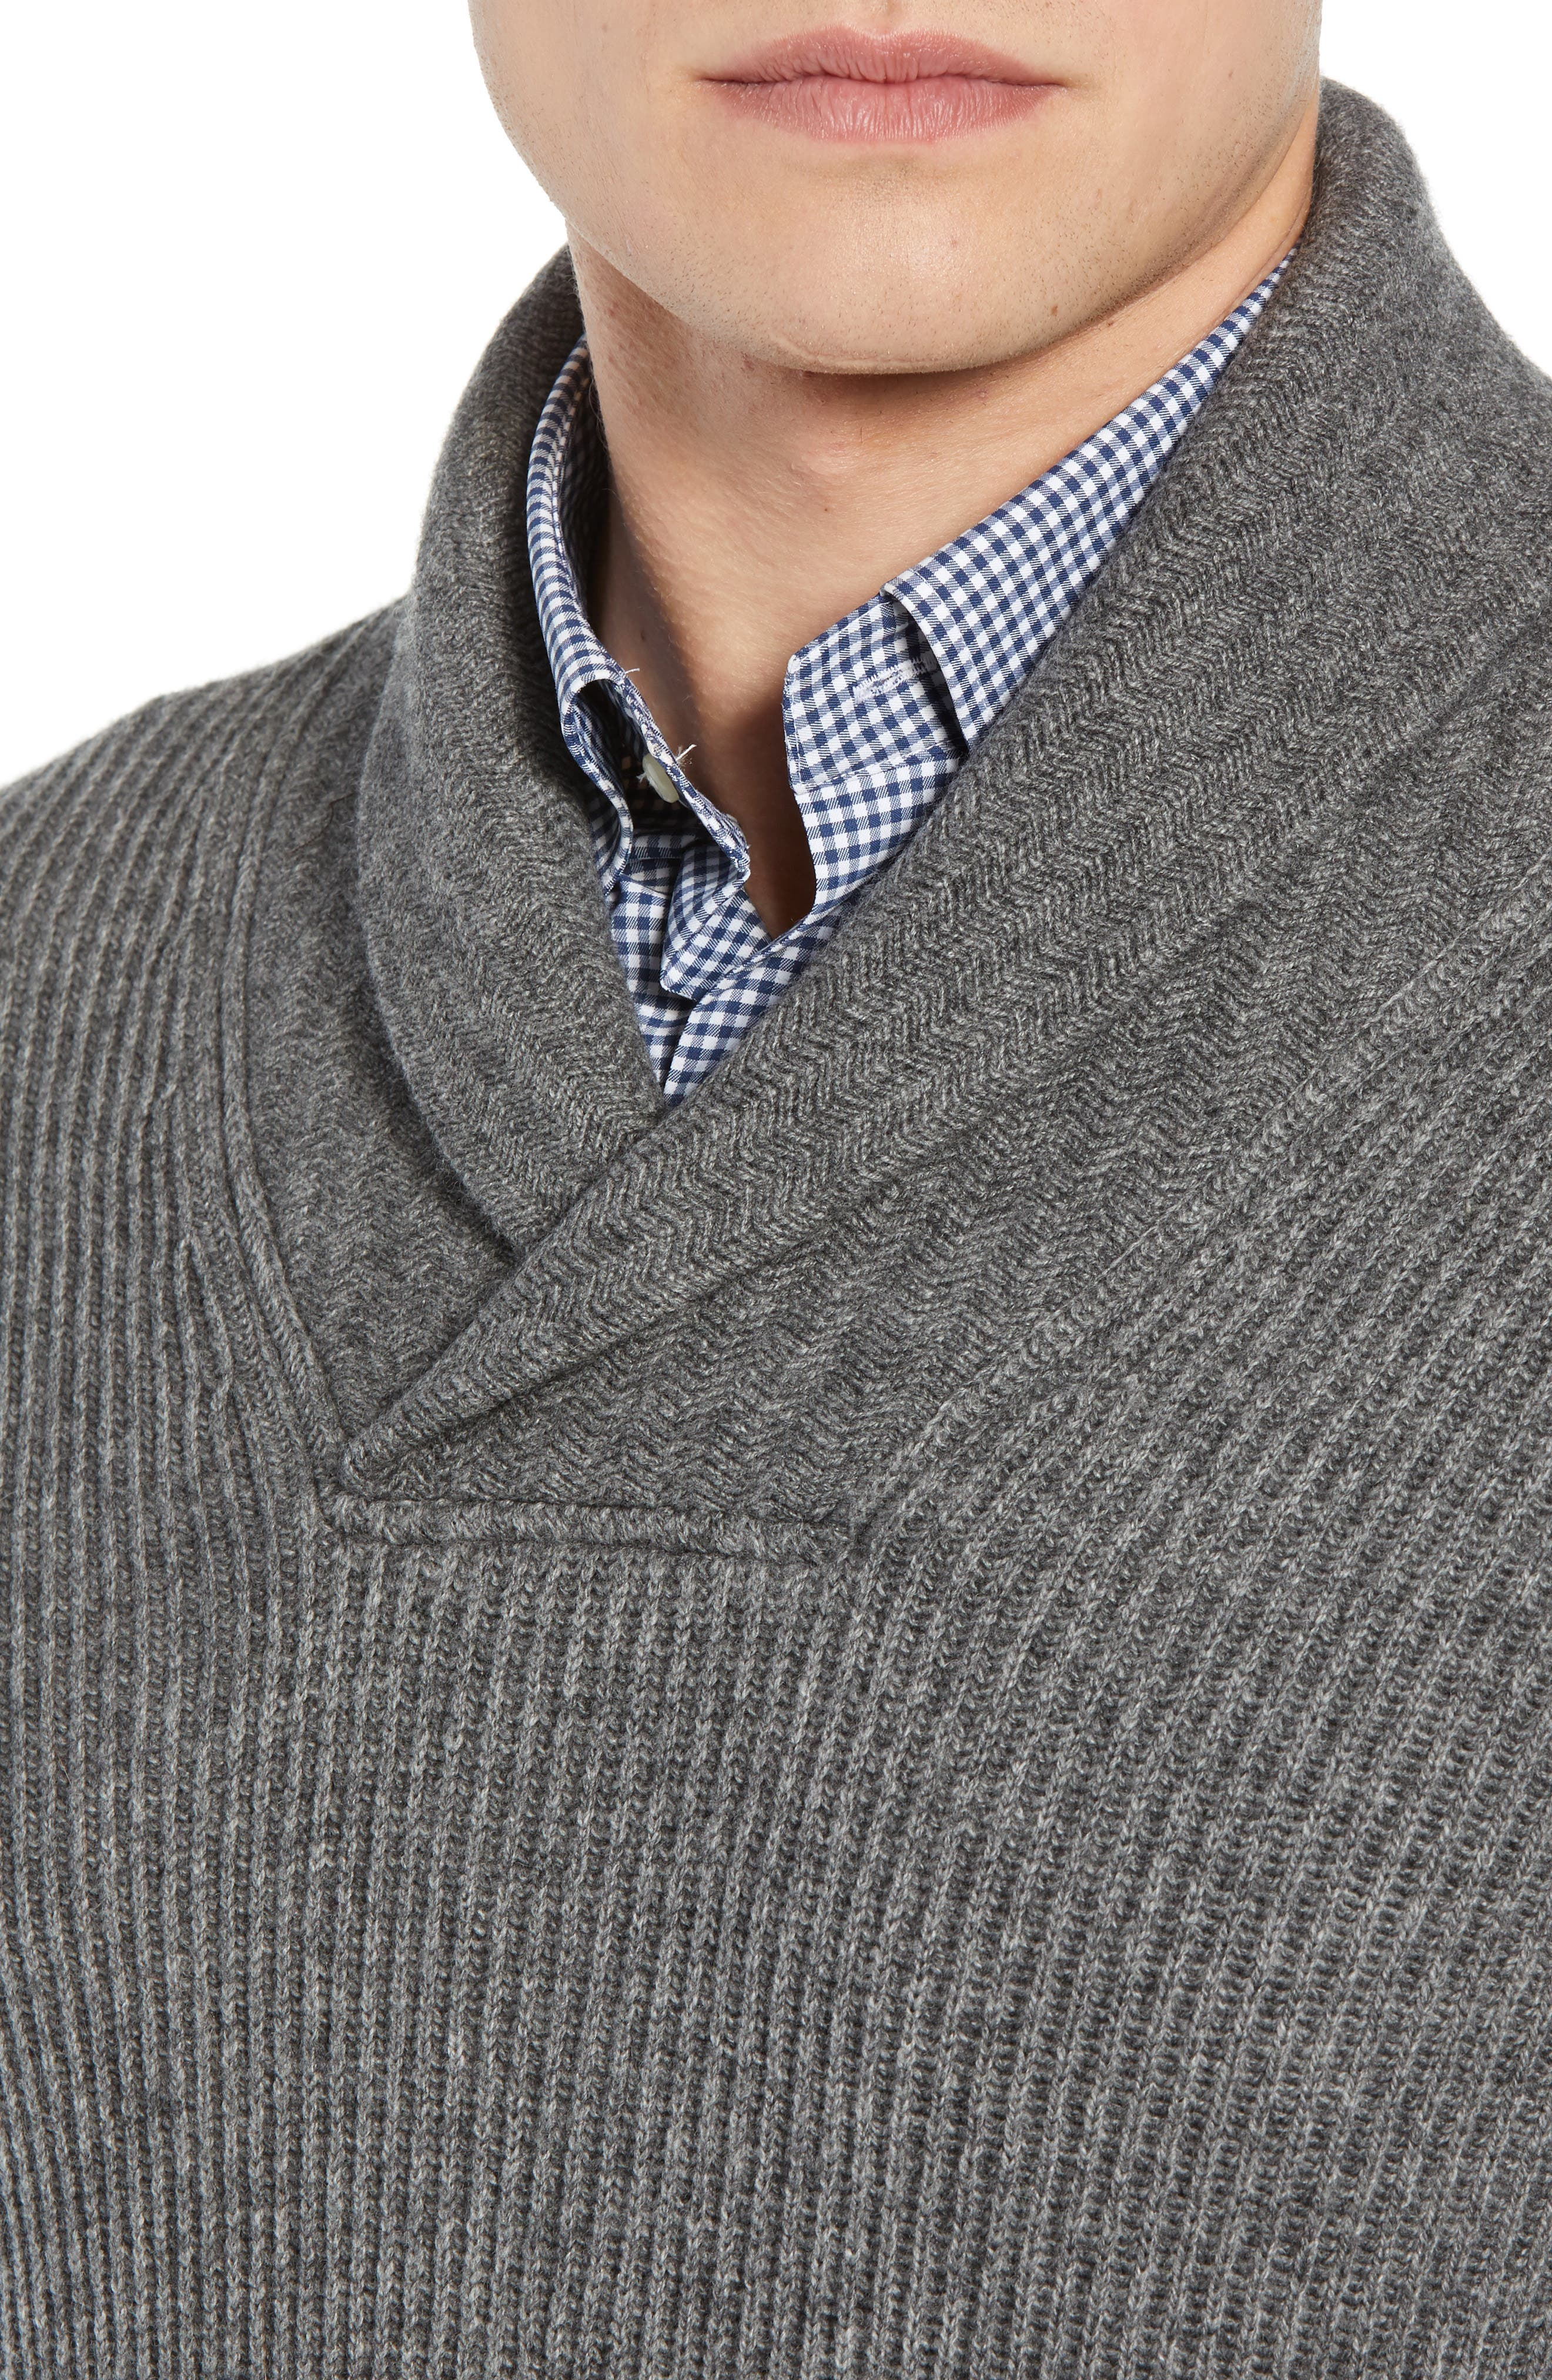 Mountainside Wool Blend Shawl Sweater,                             Alternate thumbnail 4, color,                             025